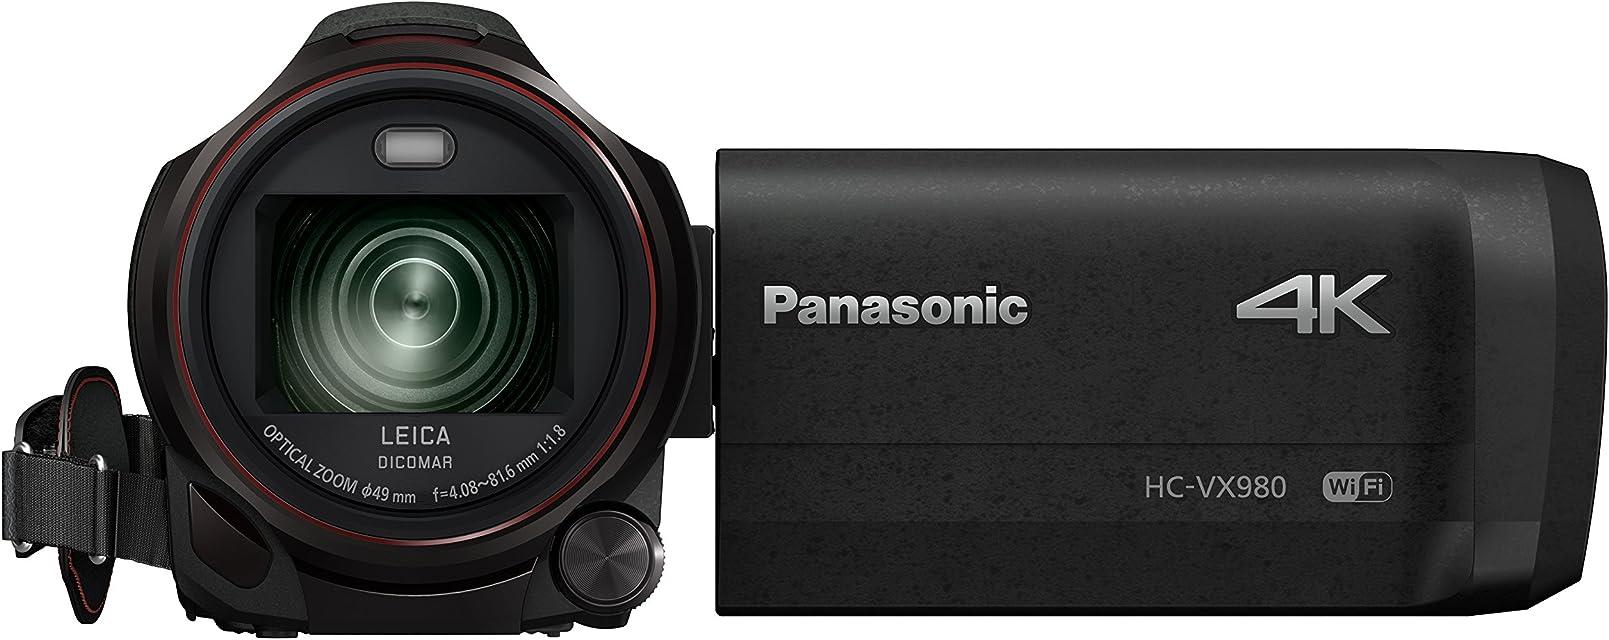 Panasonic HC-VX980EG-K - Videocámara de 18.91 MP (MOS BSI 25.4/2.3 mm (1/2.3) 4.08-81.6 mm tarjeta de memoria 4K Ultra HD) Color Negro (versión importada)